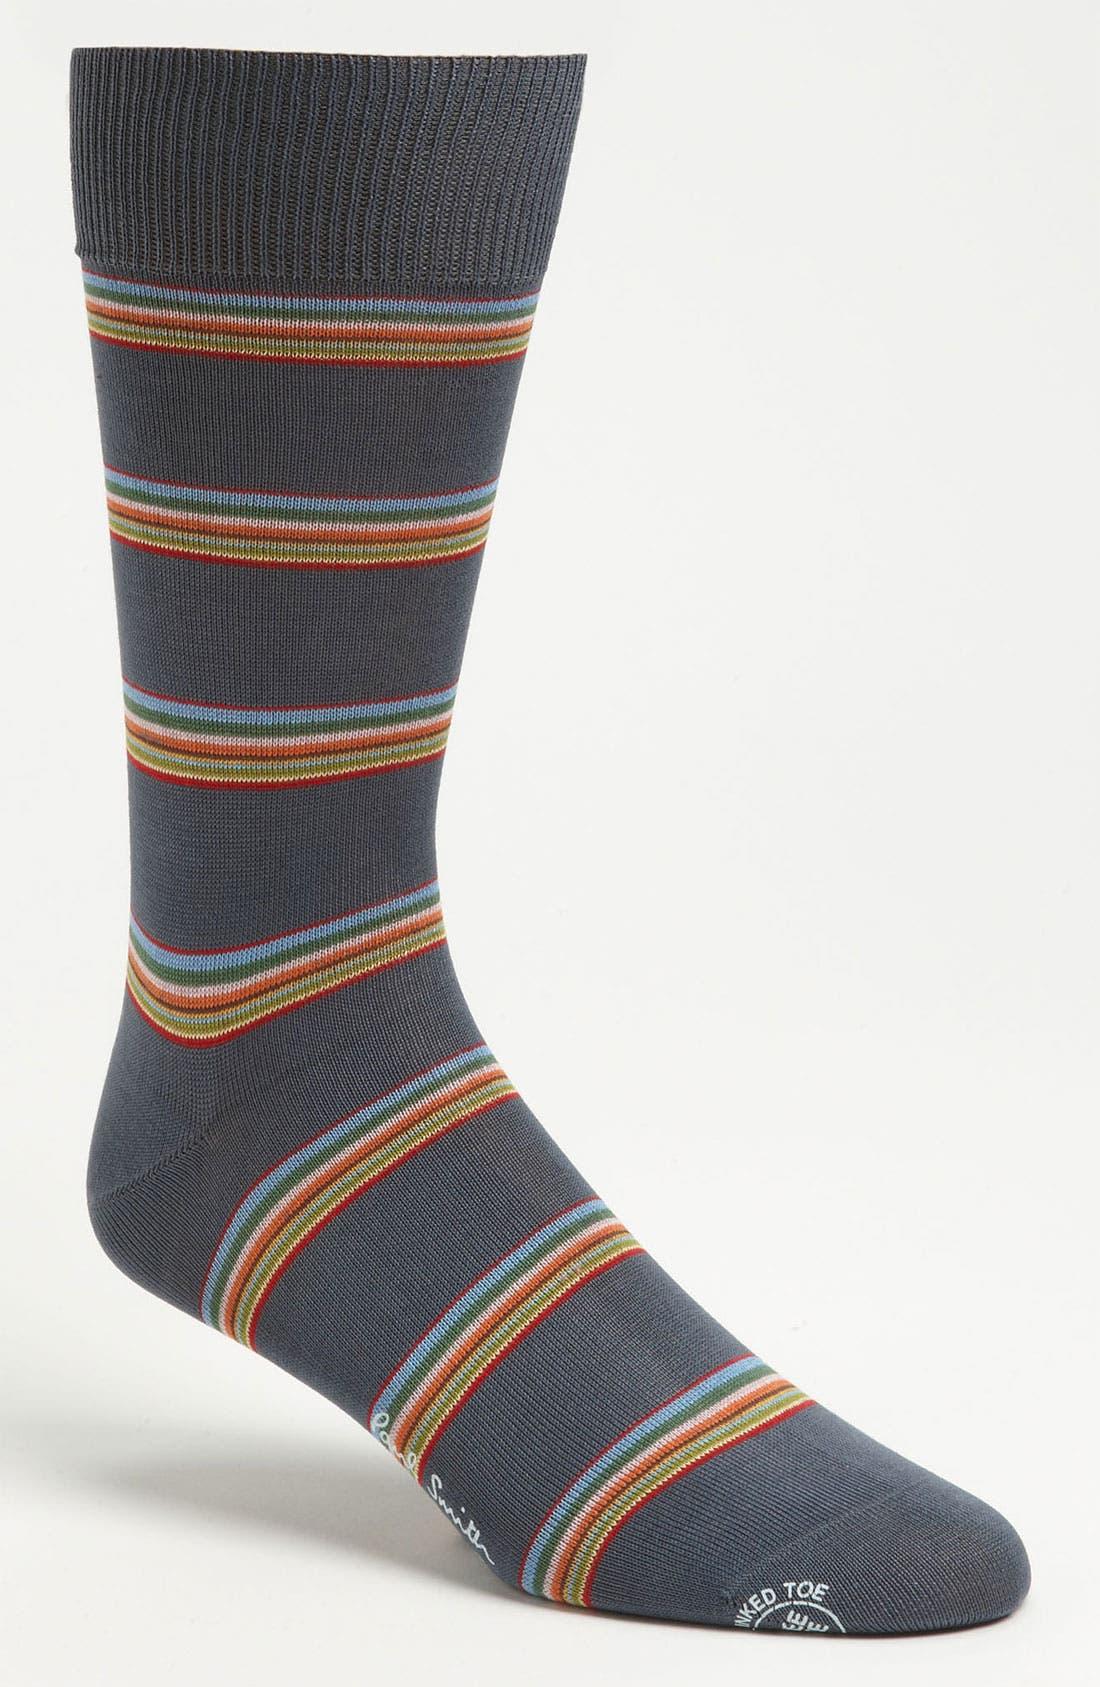 Main Image - Paul Smith Accessories Multi Block Stripe Socks